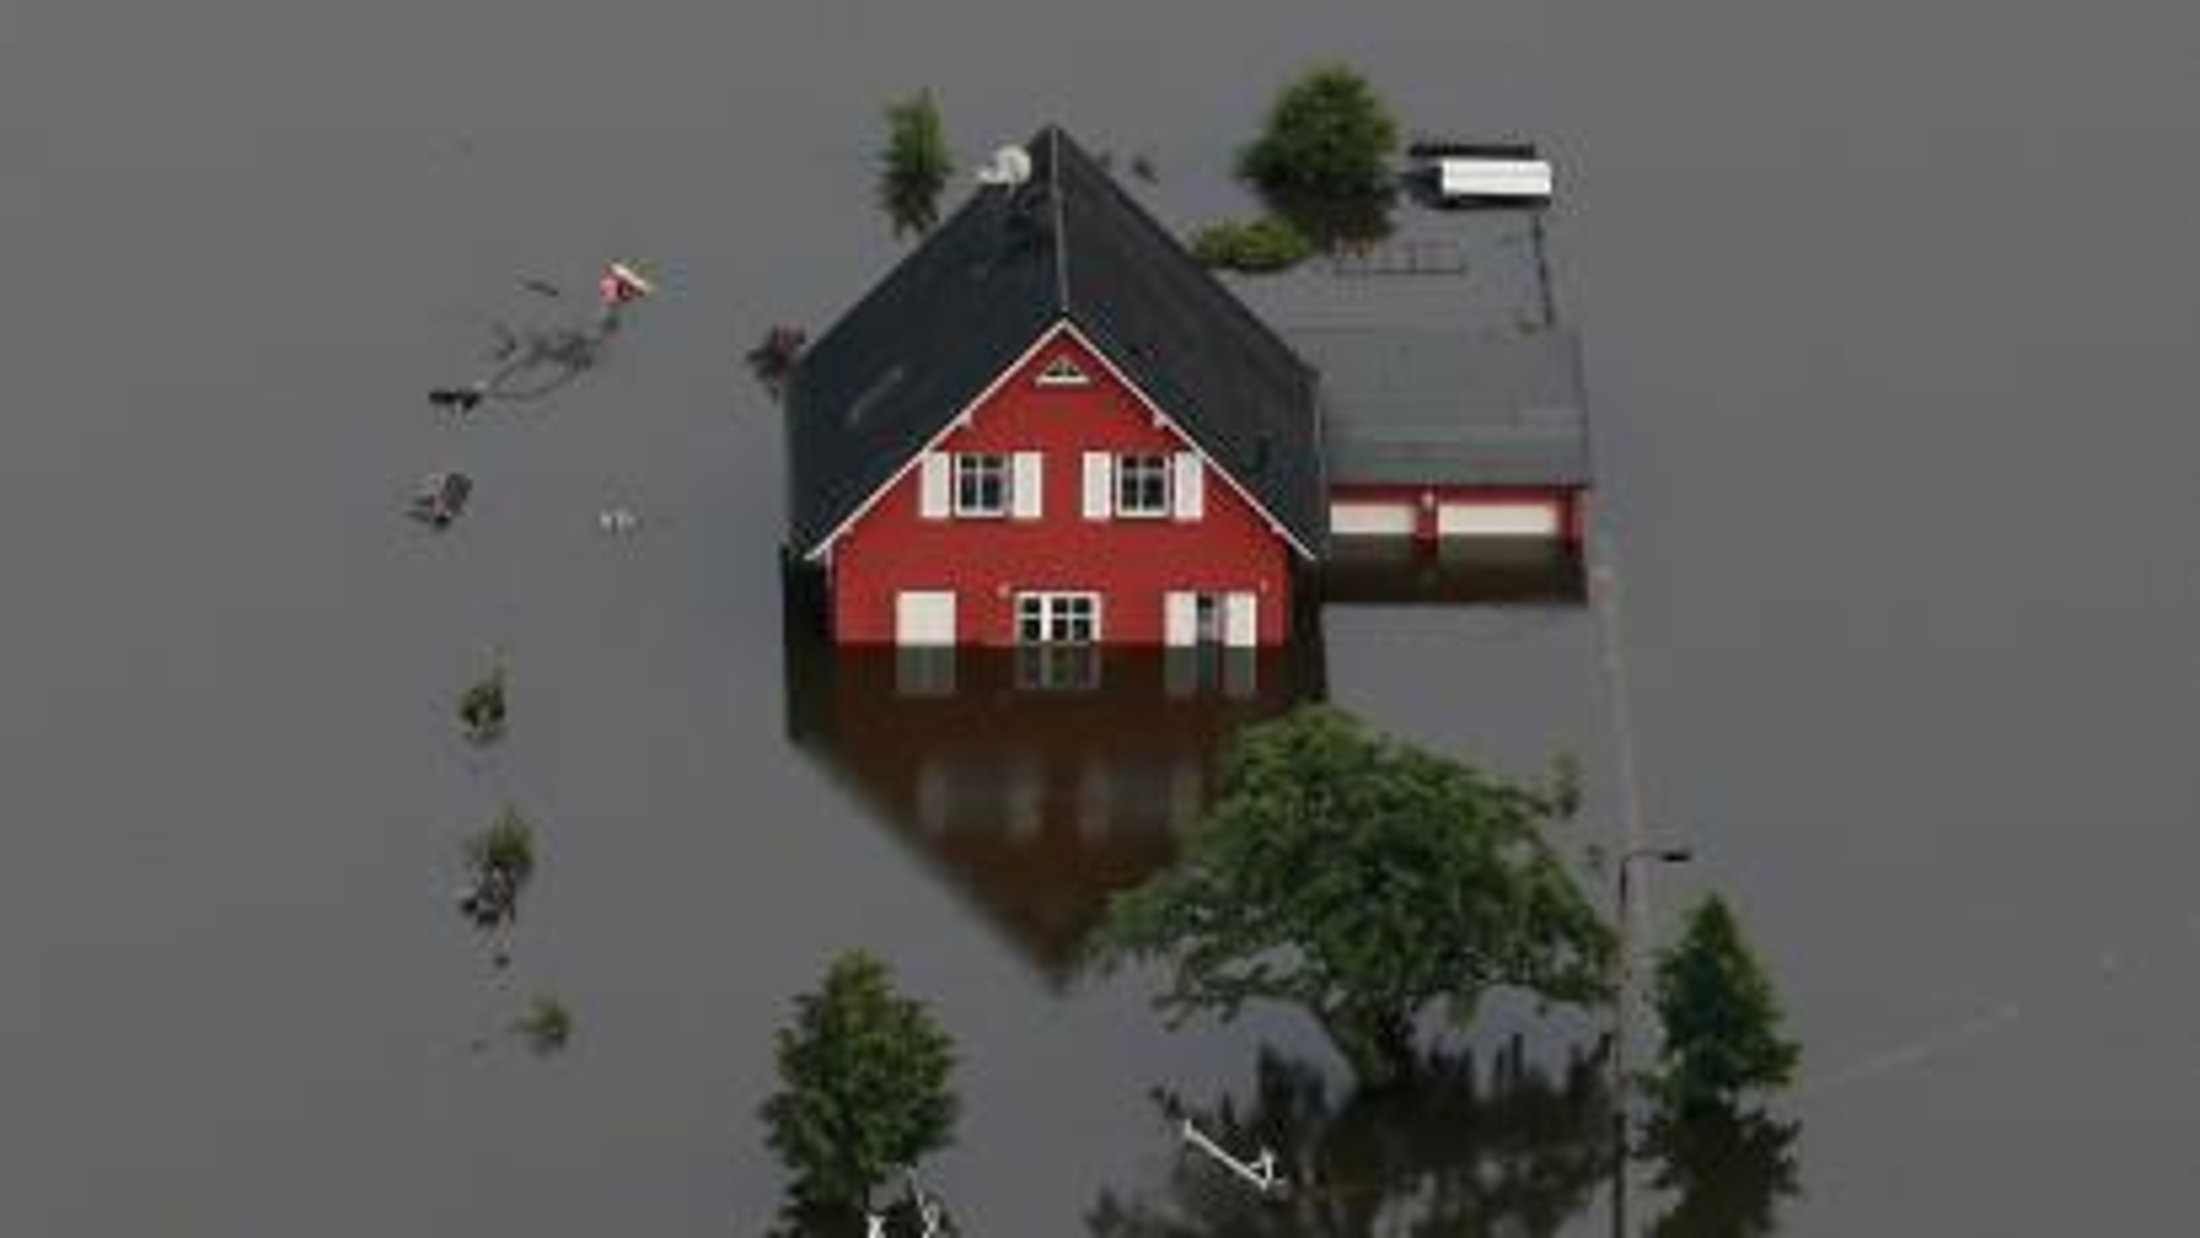 flooding central europe june 2013 insurance losses